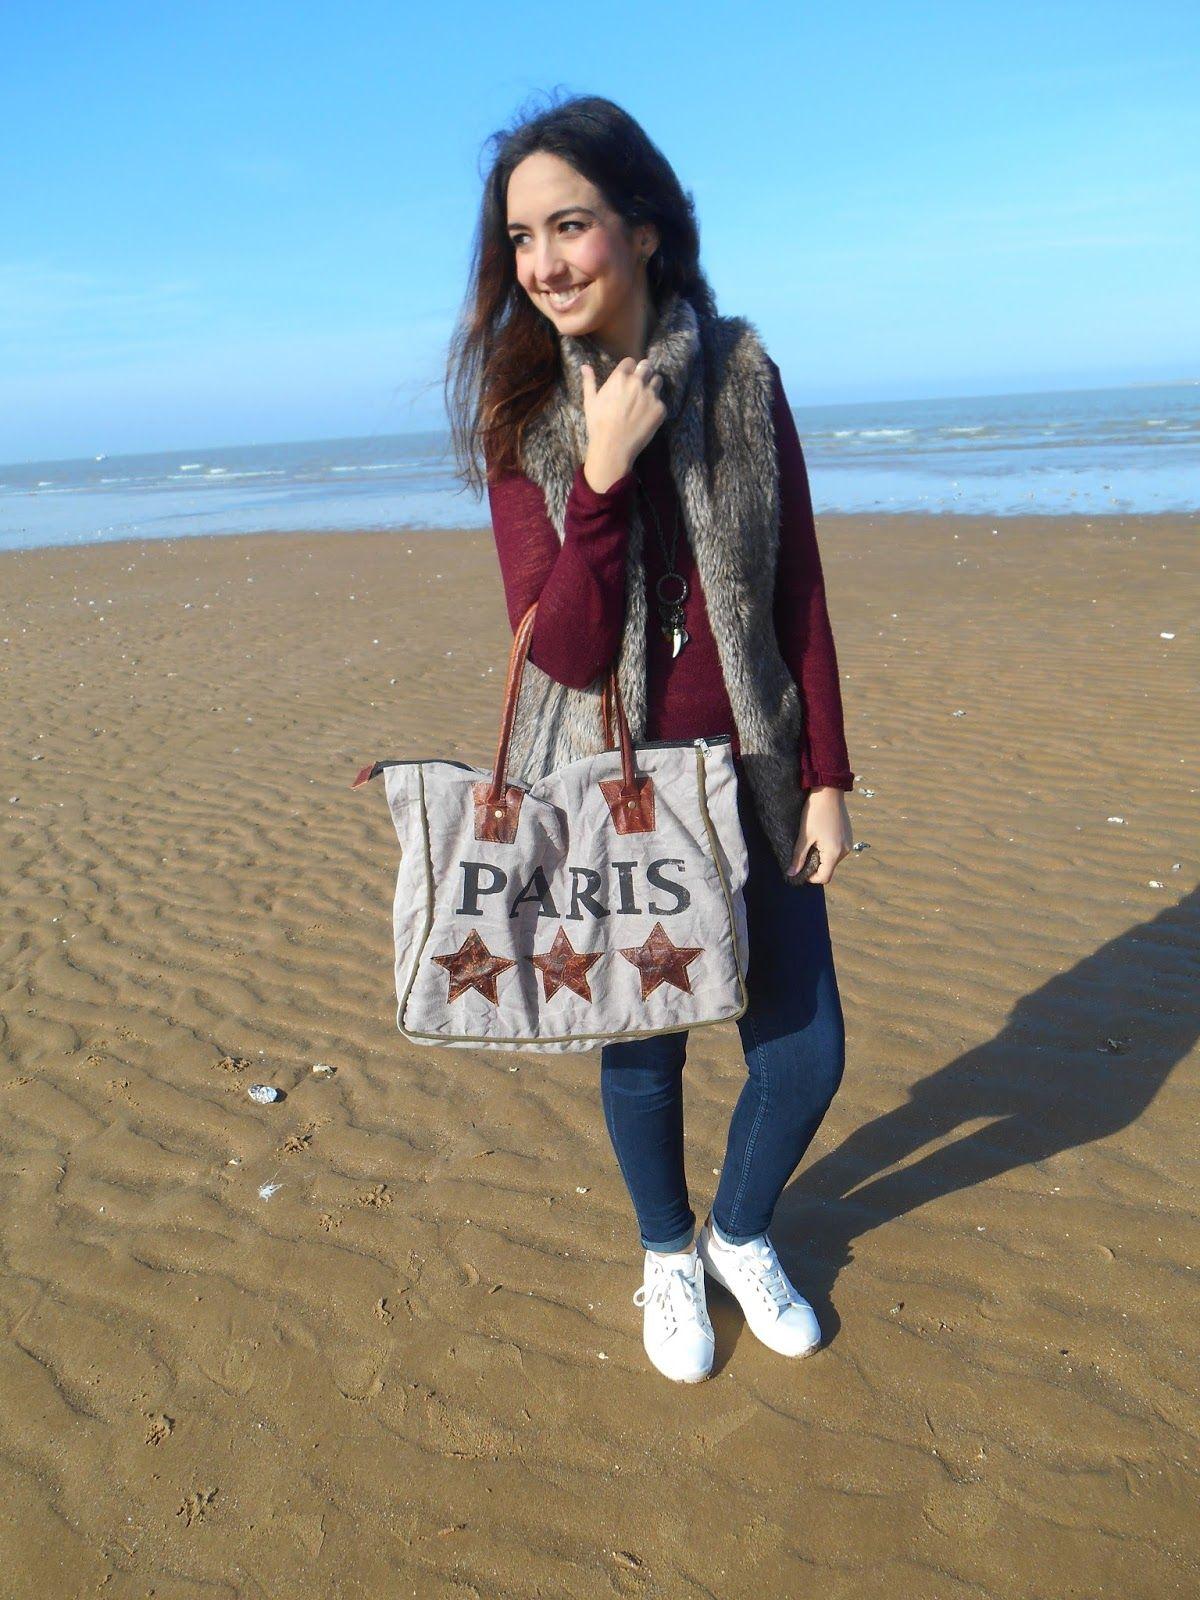 PLAYA EN INVIERNO   All about Style   Pinterest   Playa Invierno y Blog